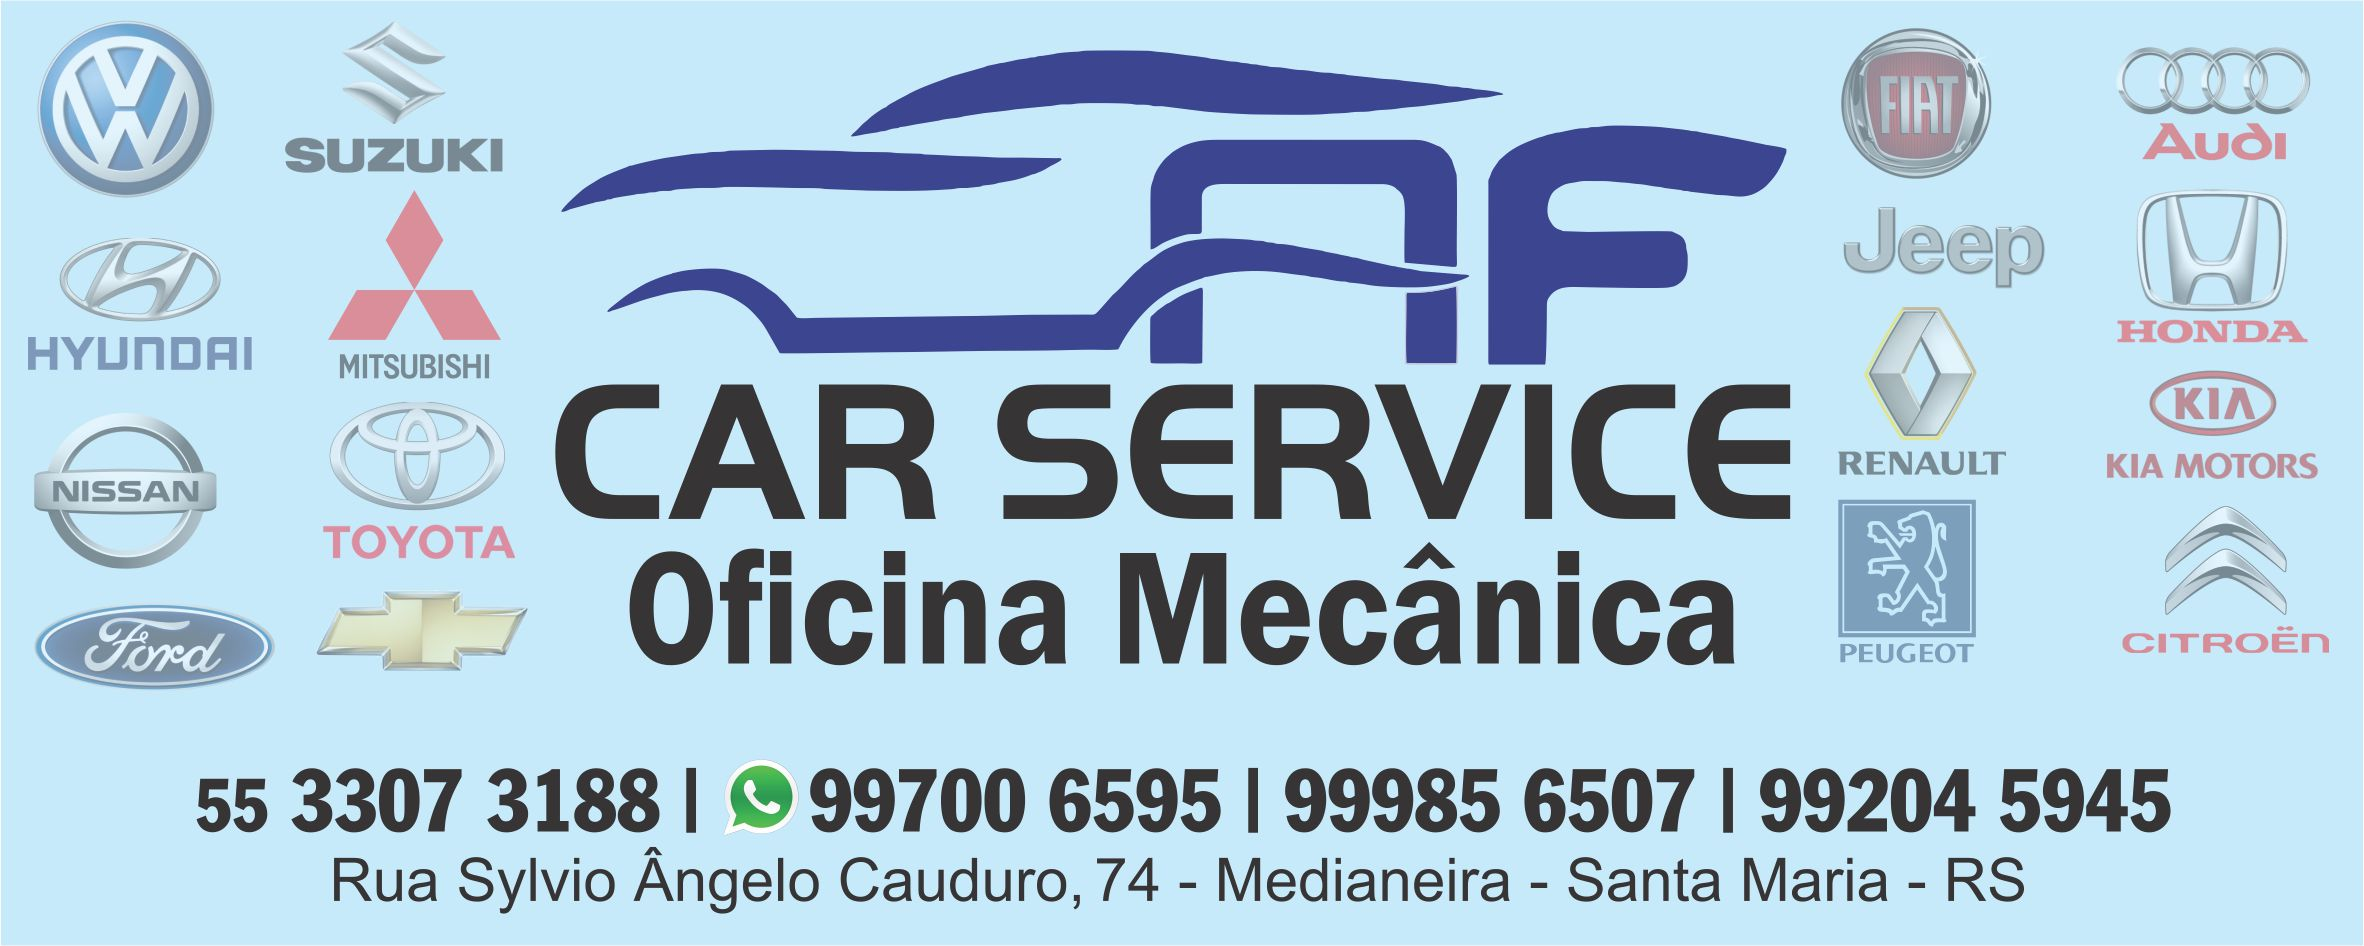 afcarservice.site.com.br